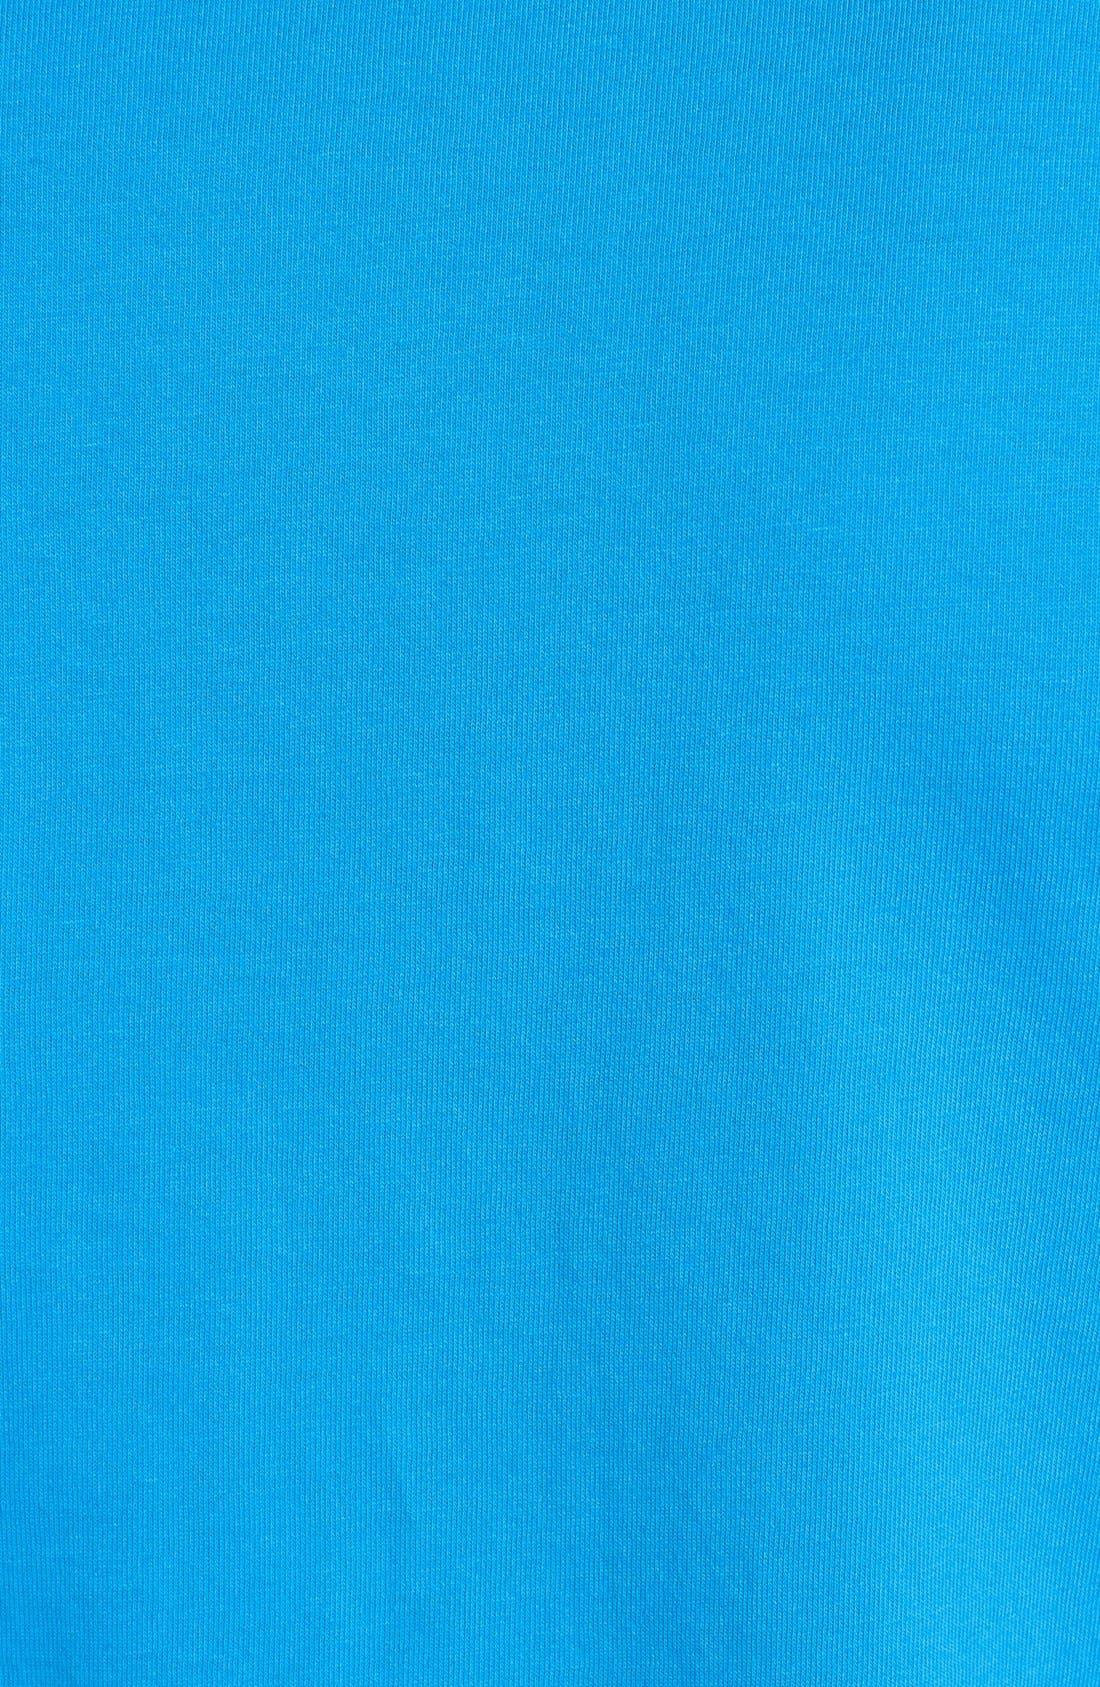 Alternate Image 3  - Junk Food 'Carolina Panthers - Kick Off' Graphic T-Shirt